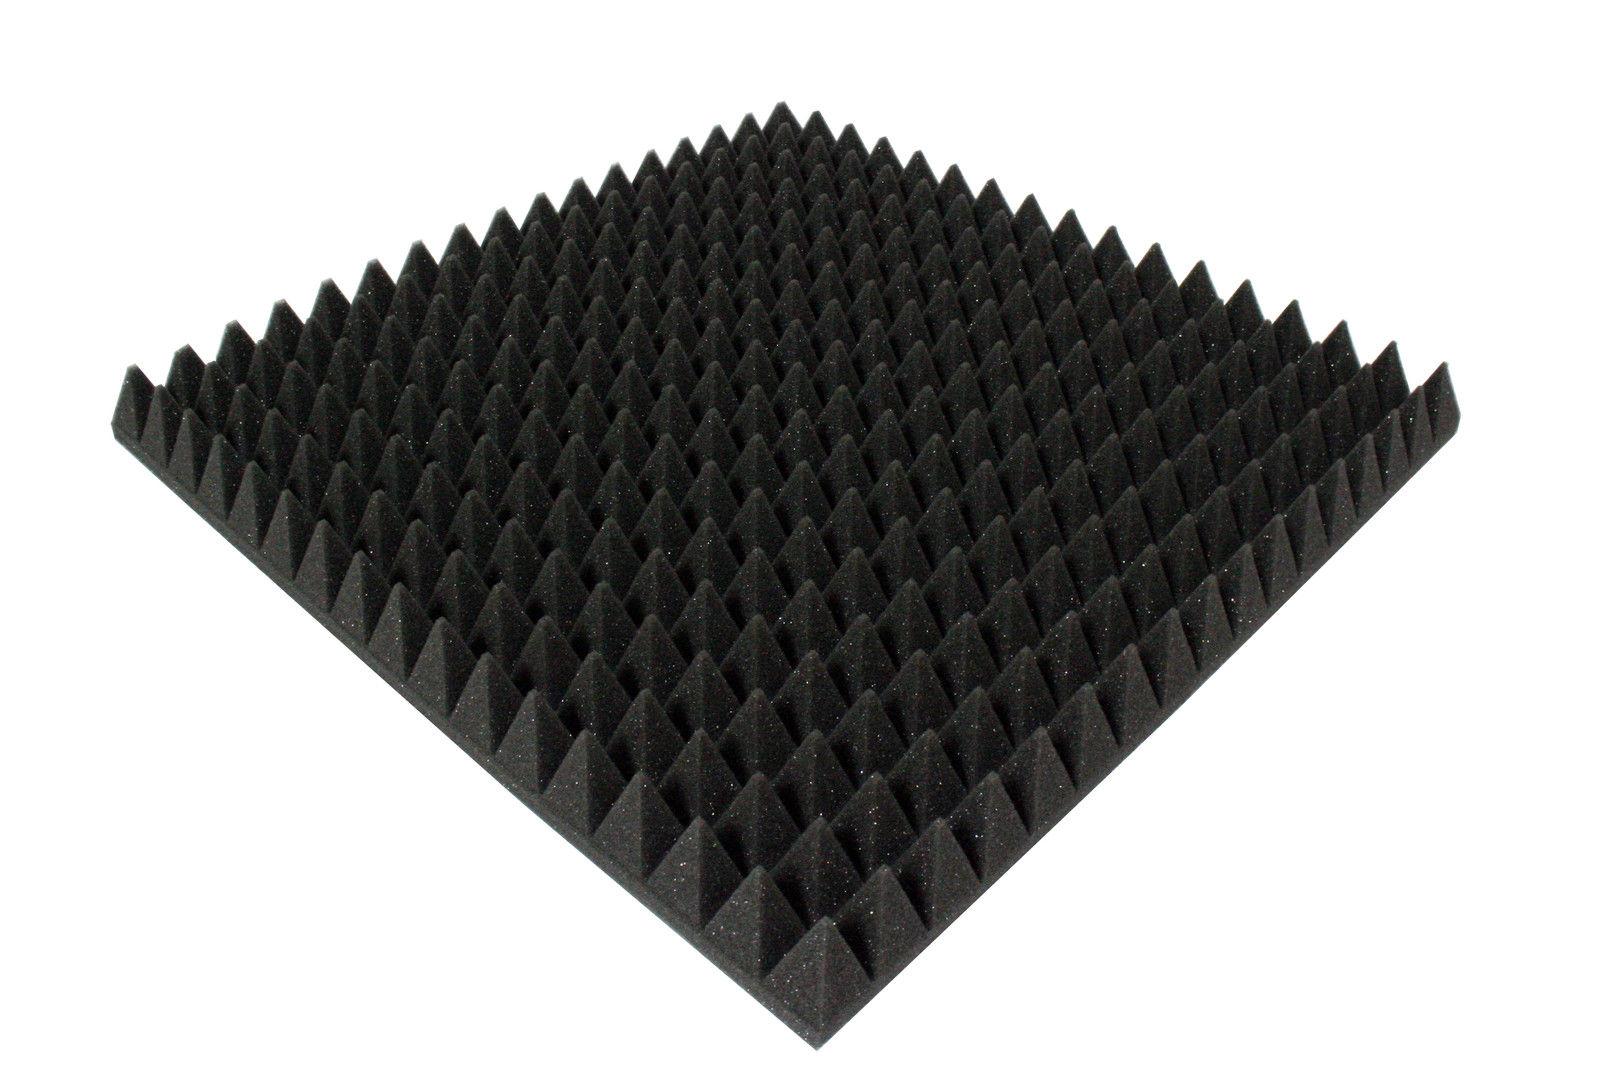 Acoustic Foam Pyramid Tiles